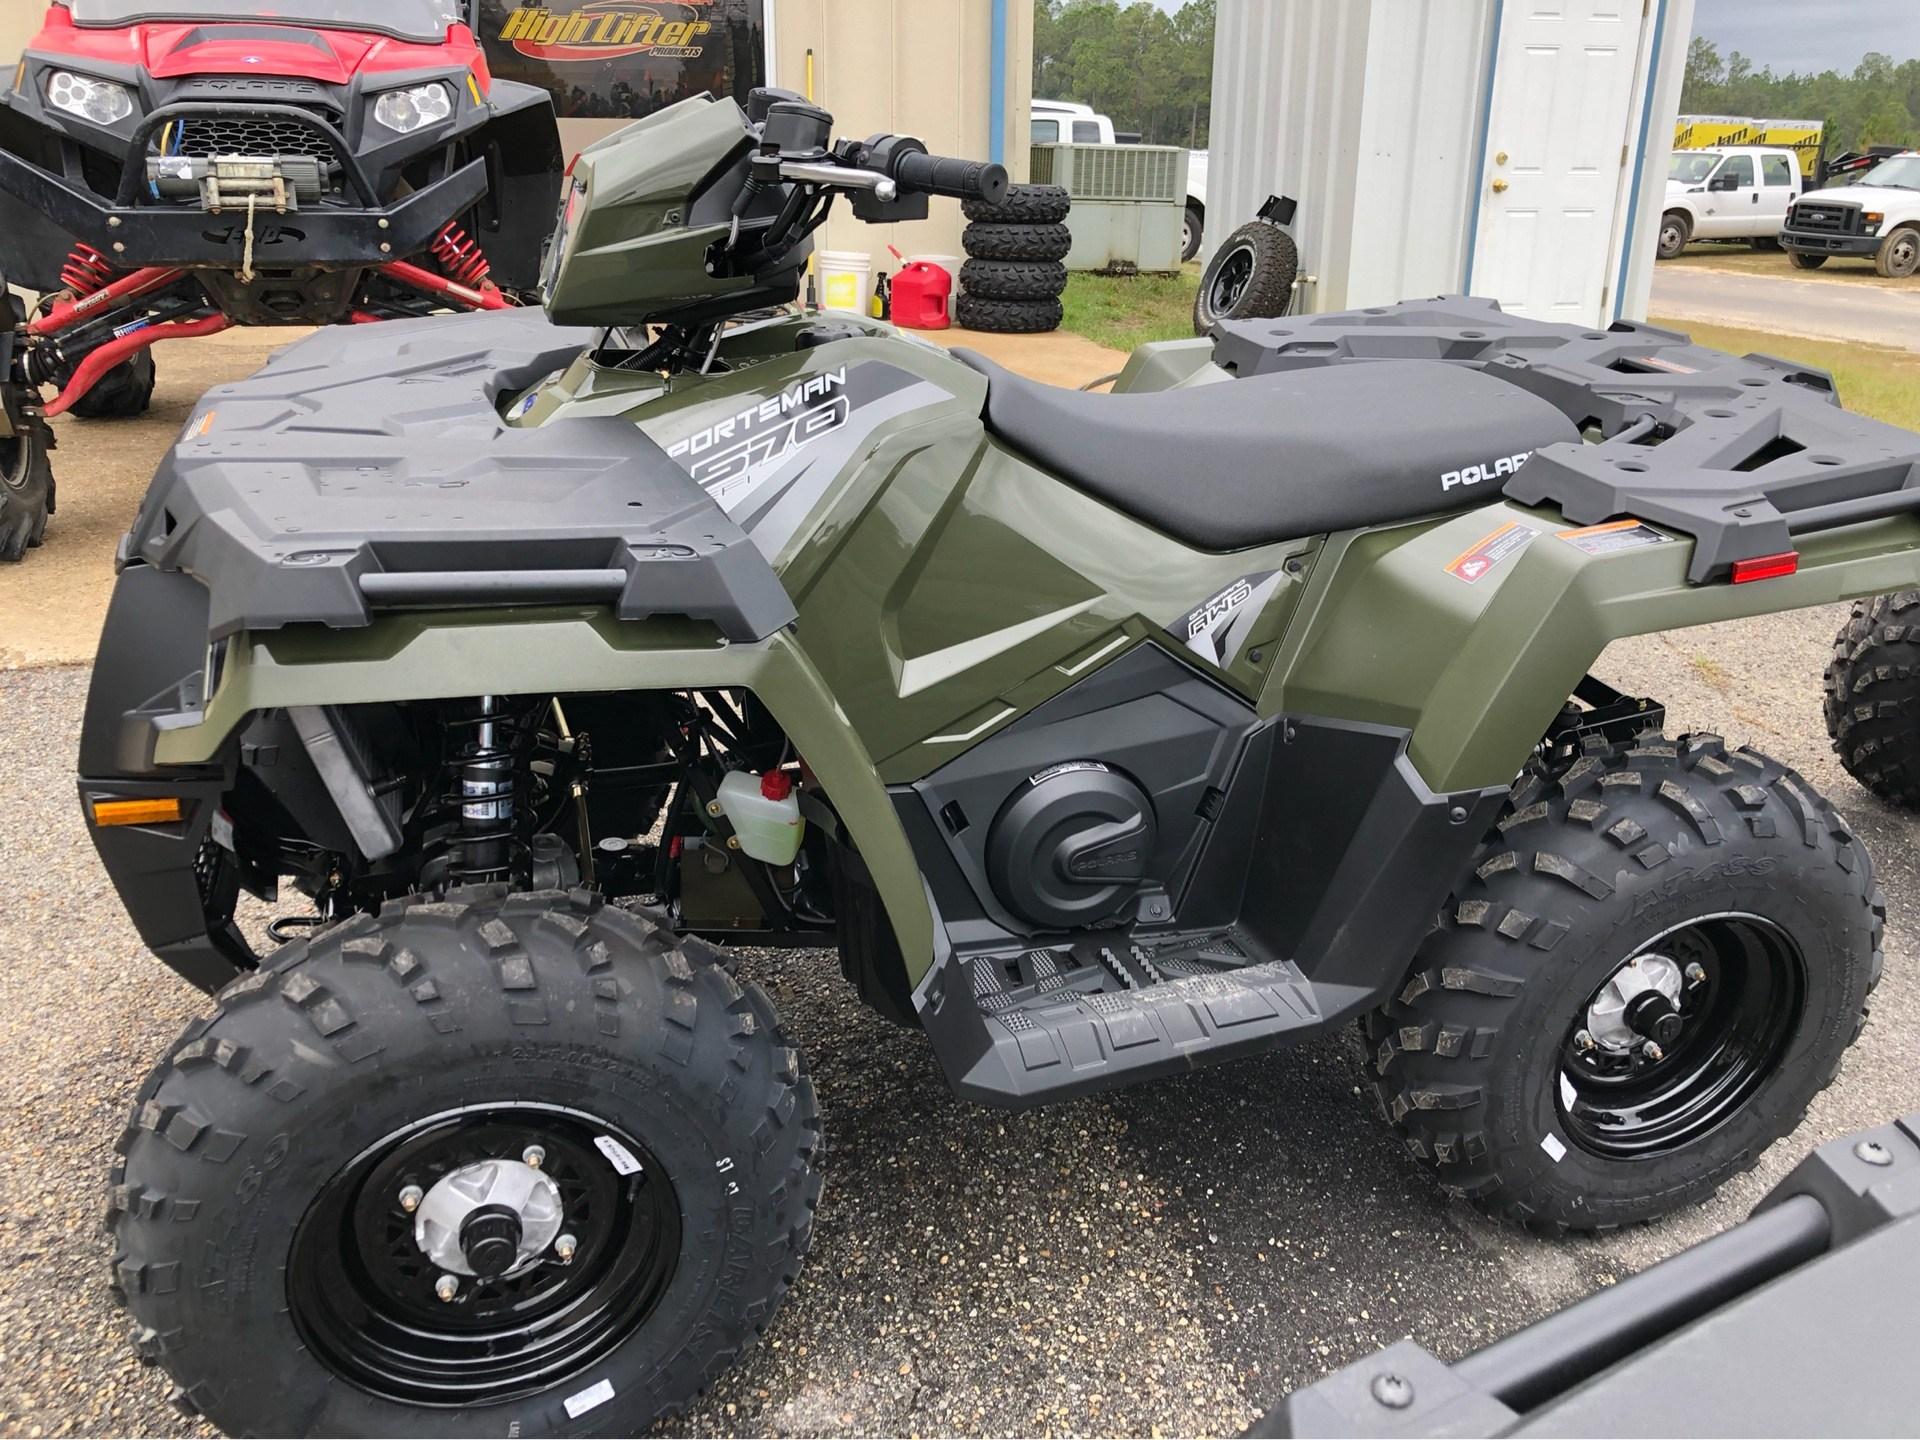 2019 Polaris Sportsman 570 in Saucier, Mississippi